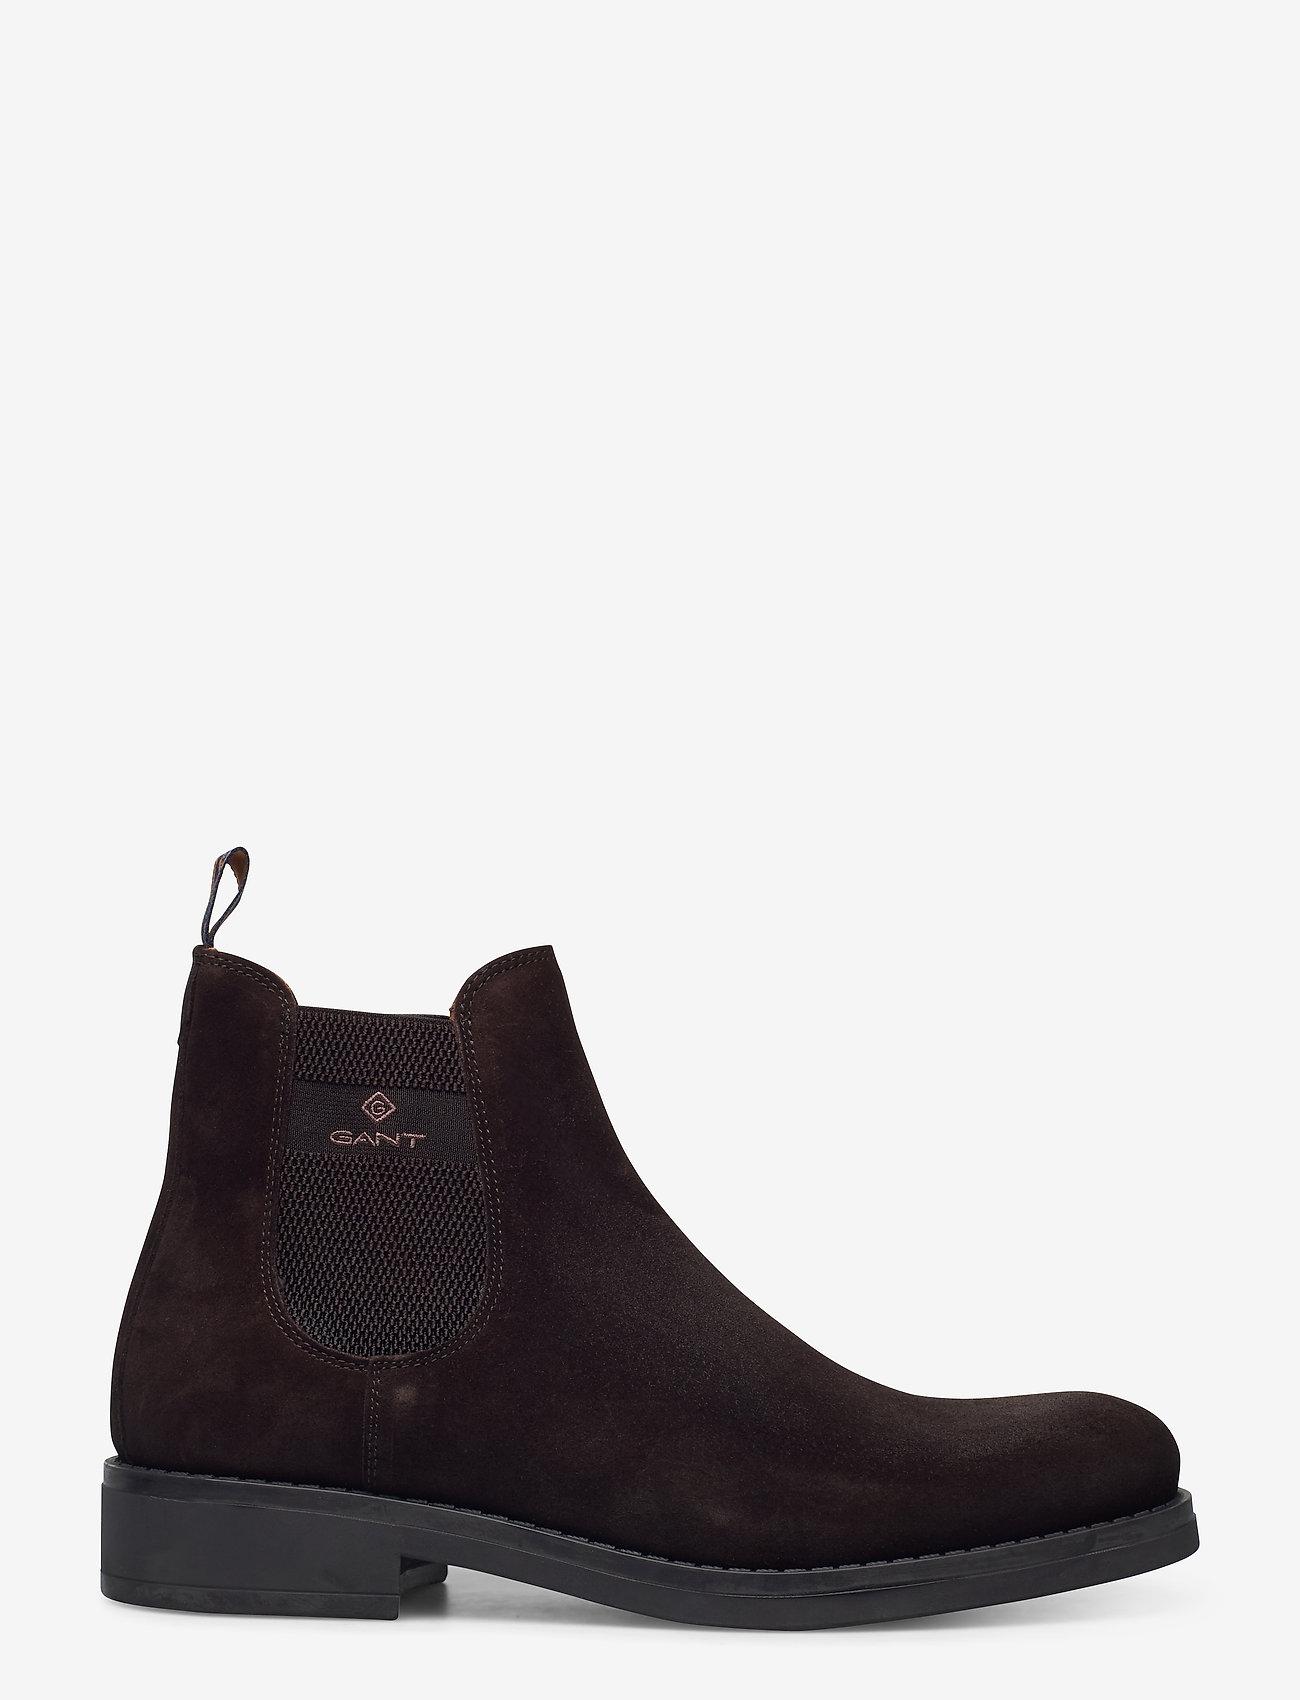 GANT - Brookly Chelsea - chelsea boots - dark brown - 1